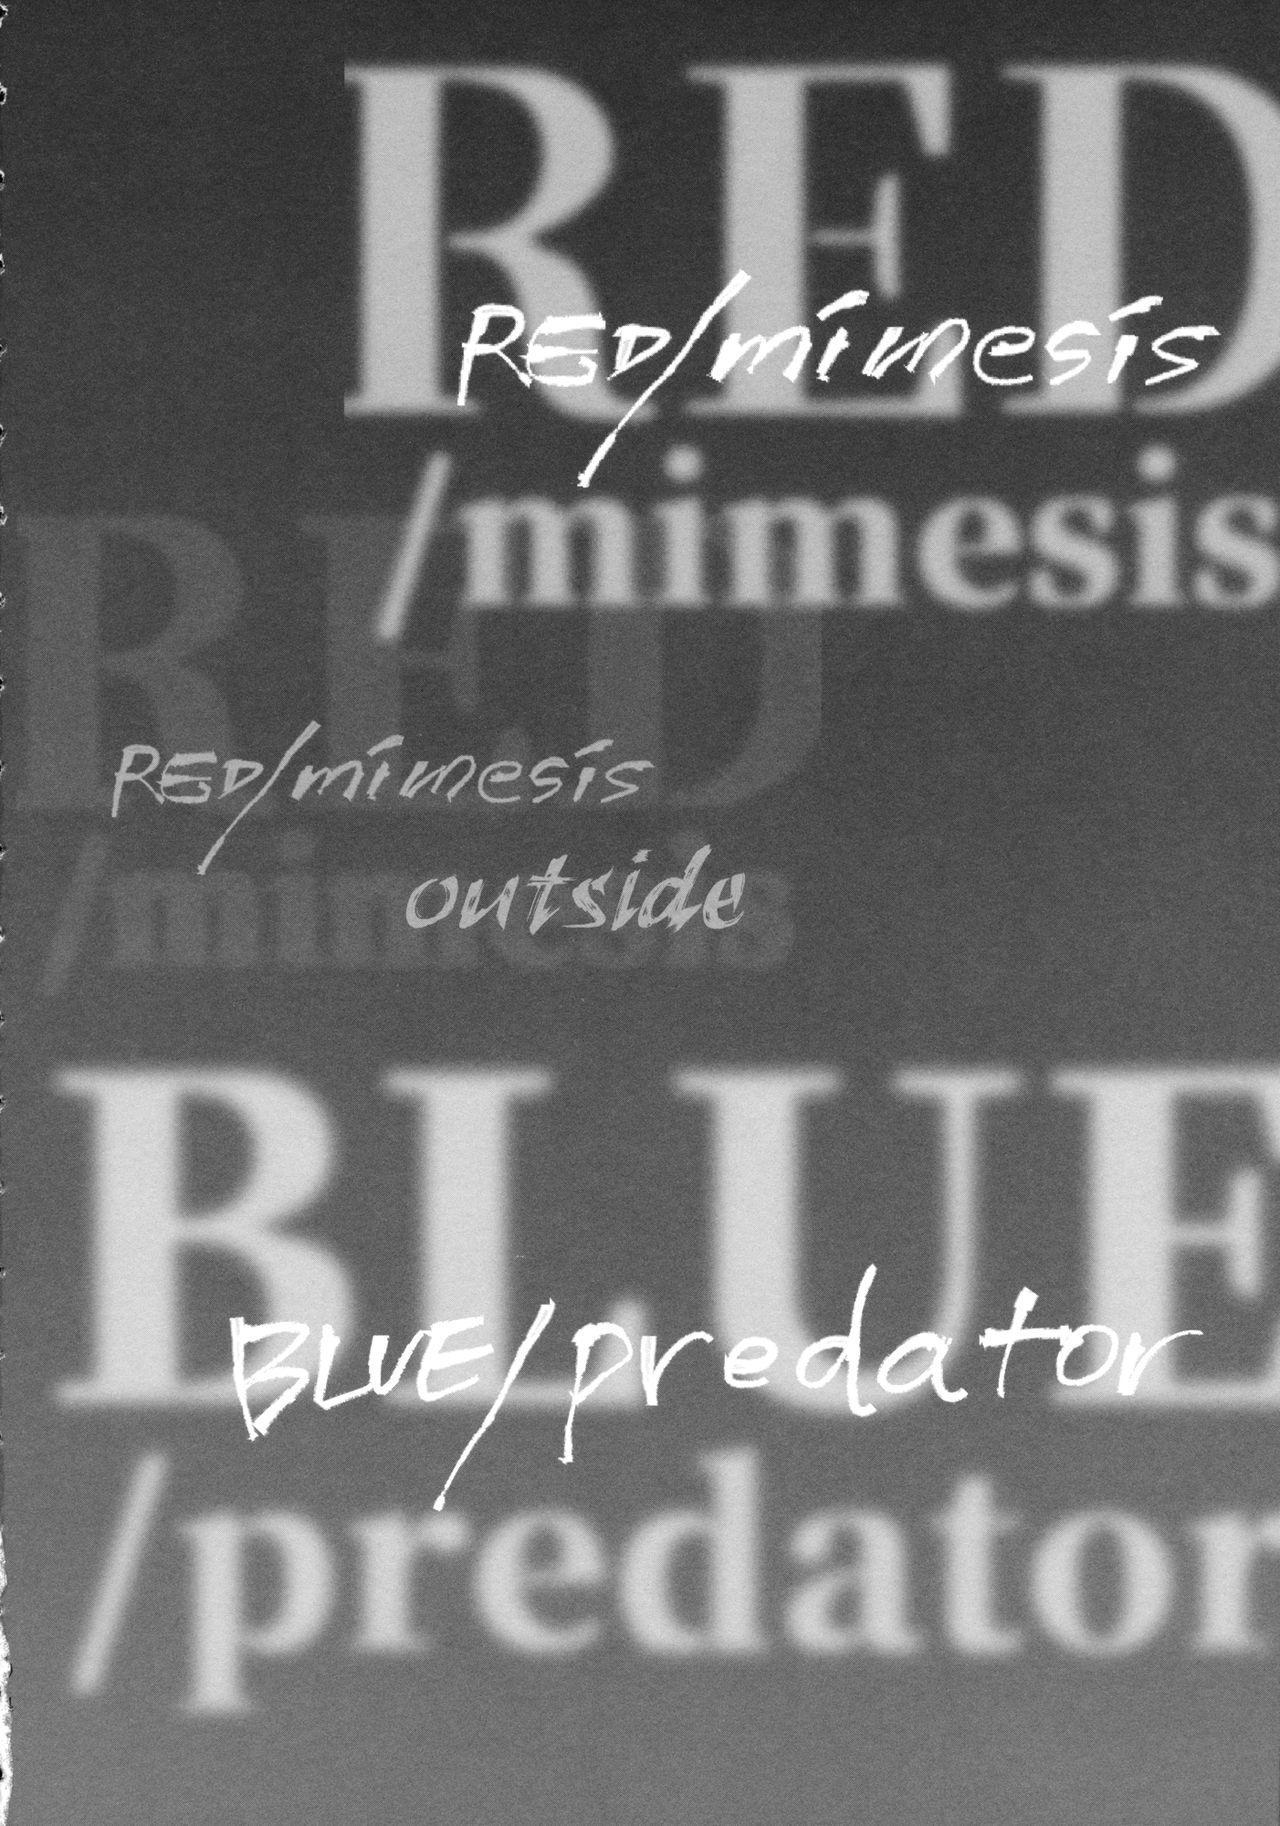 BLUE/predator 2